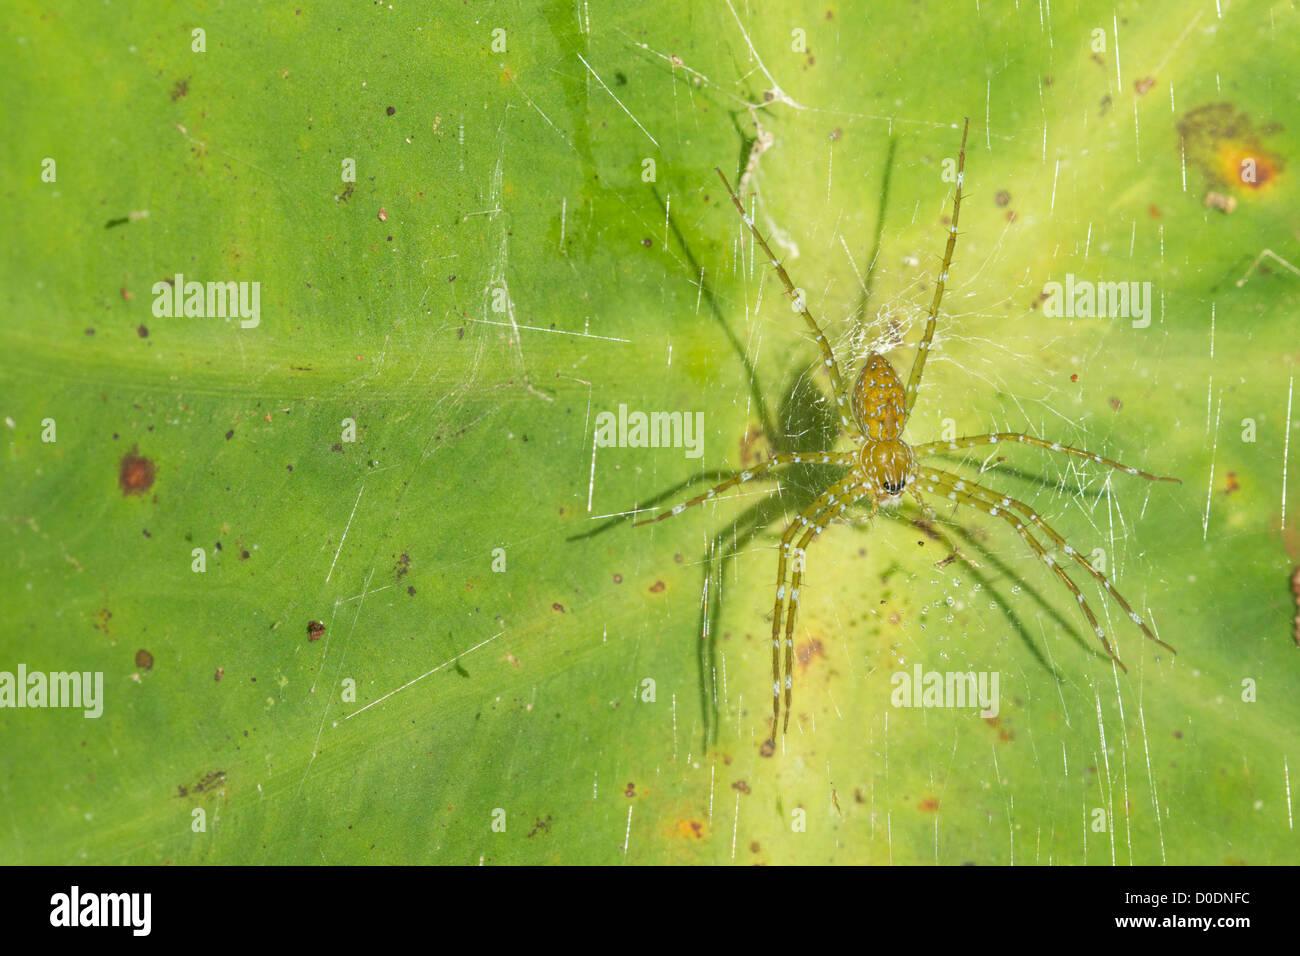 A Nursery Web Spider, Pisauridae sp. - Stock Image